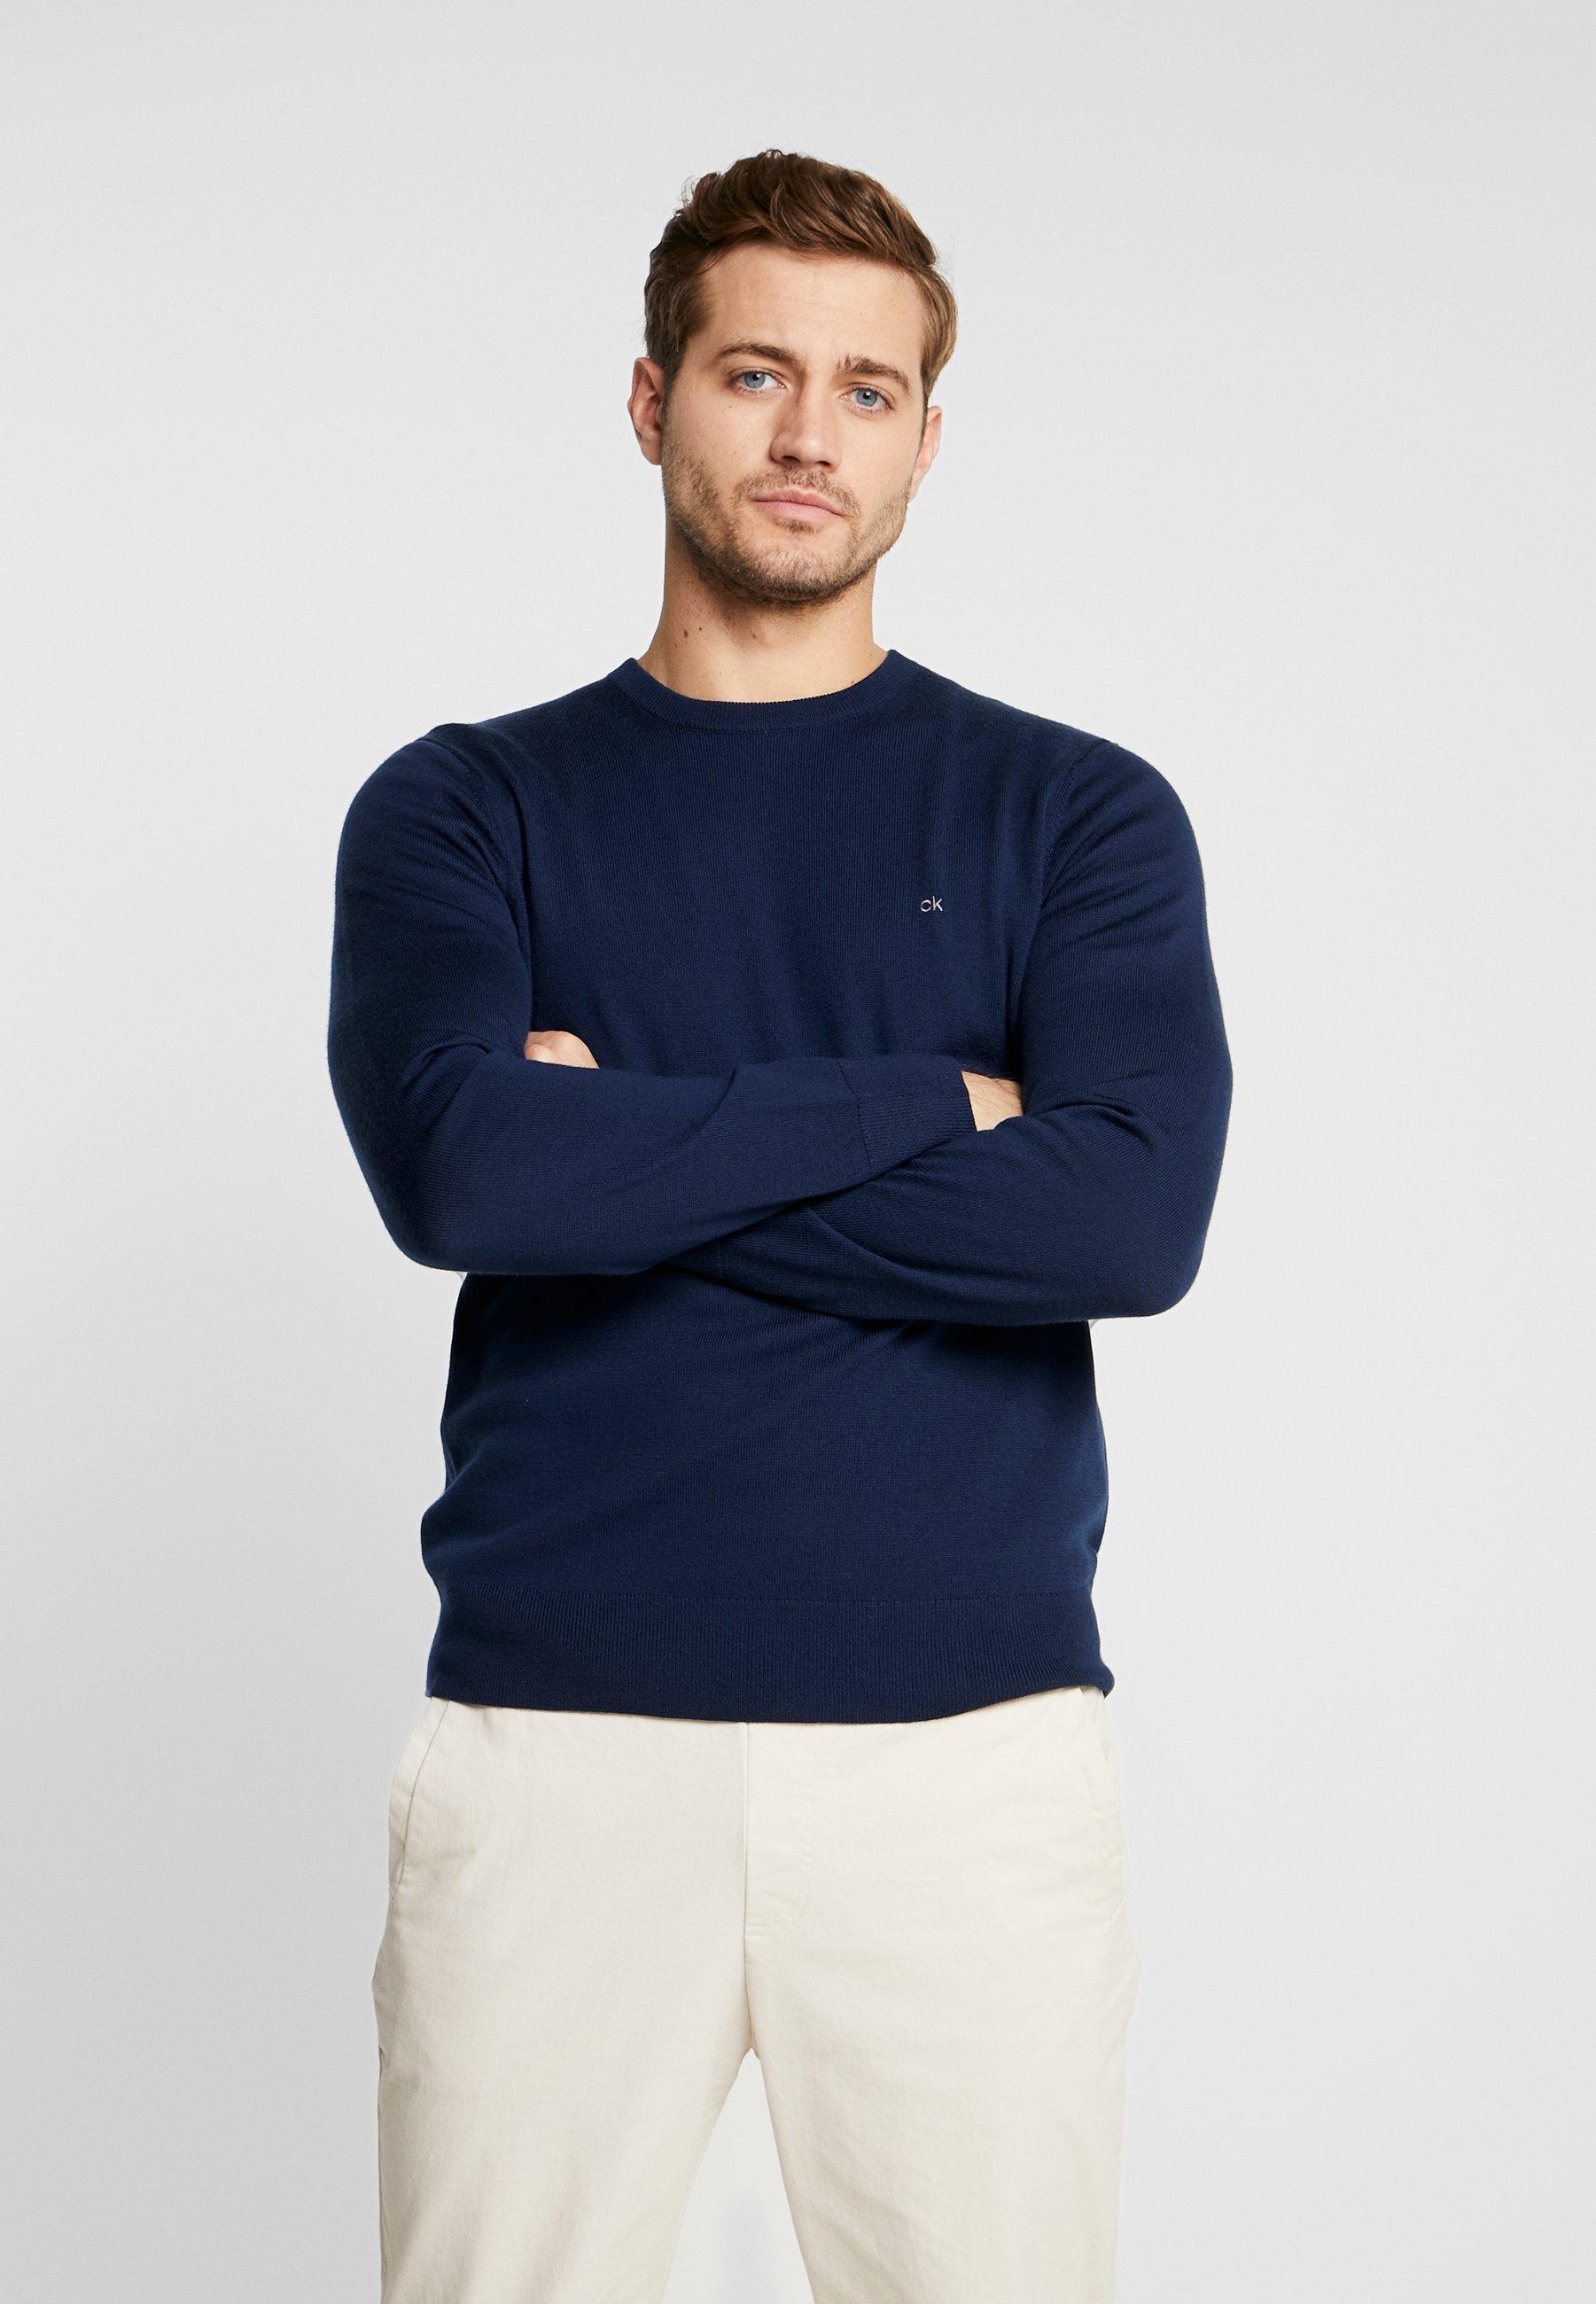 NeckMaglione Blue Crew Klein Calvin Superior Tailored 2DHIE9